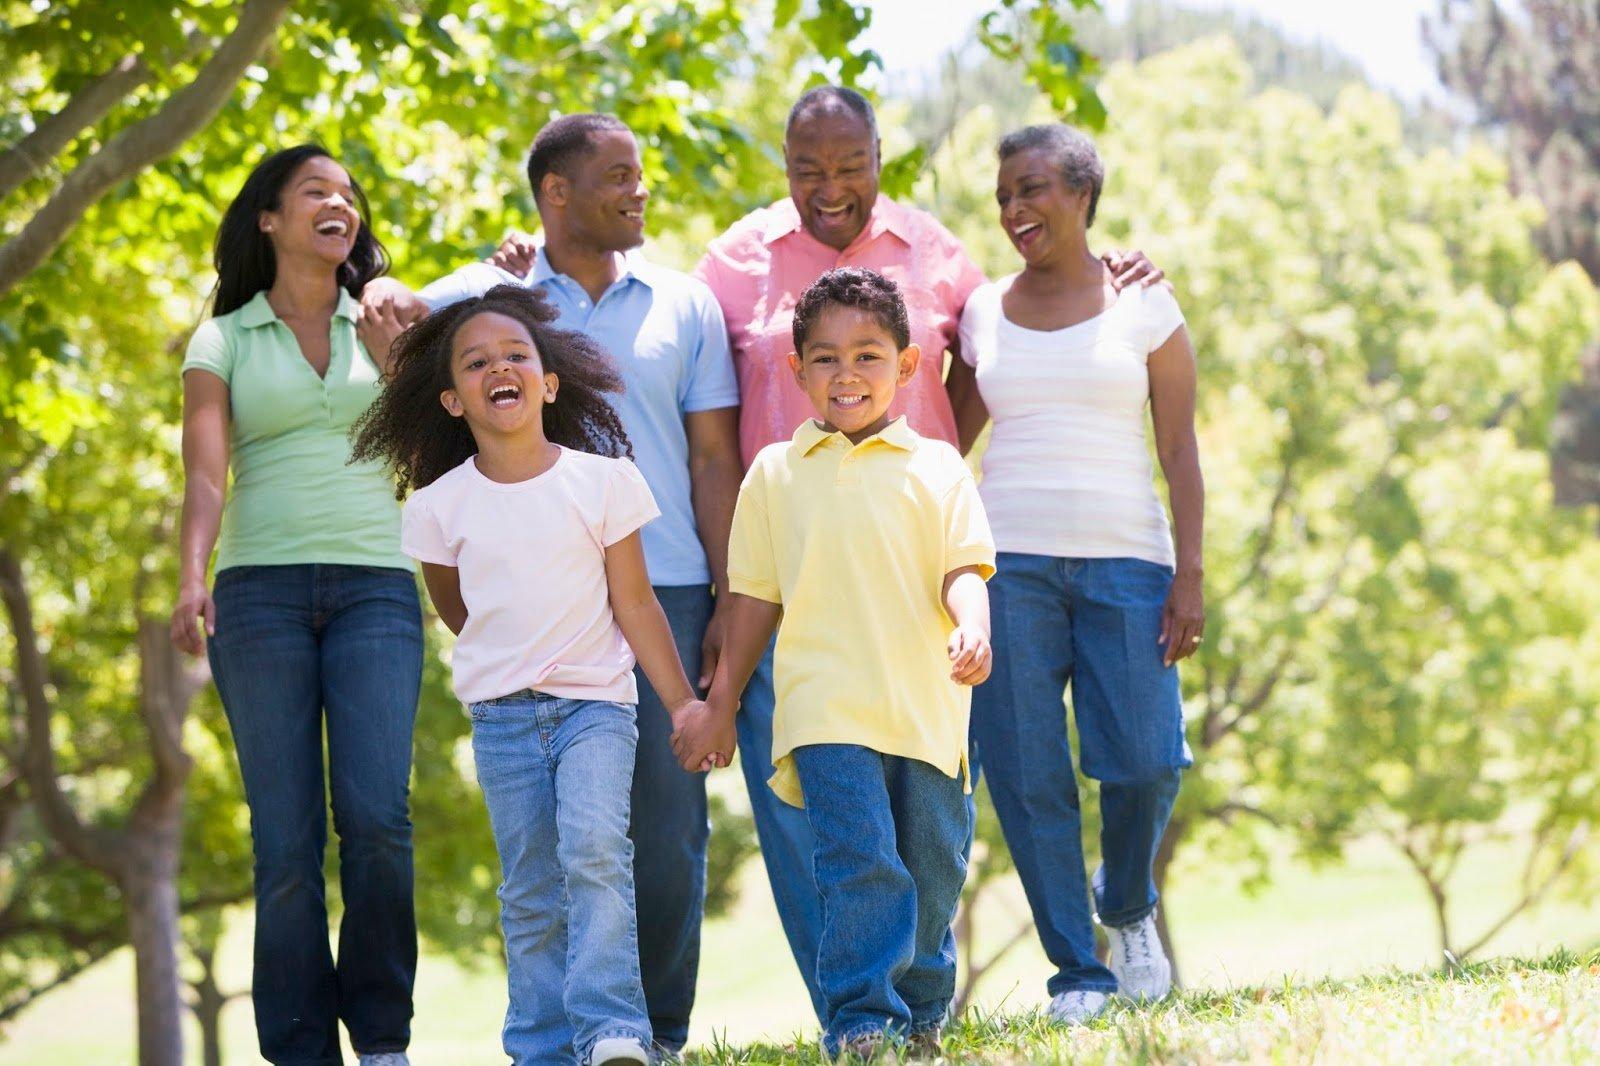 Blacks are Living Longer But Several Health Risk Factors Still Loom for Black Youth